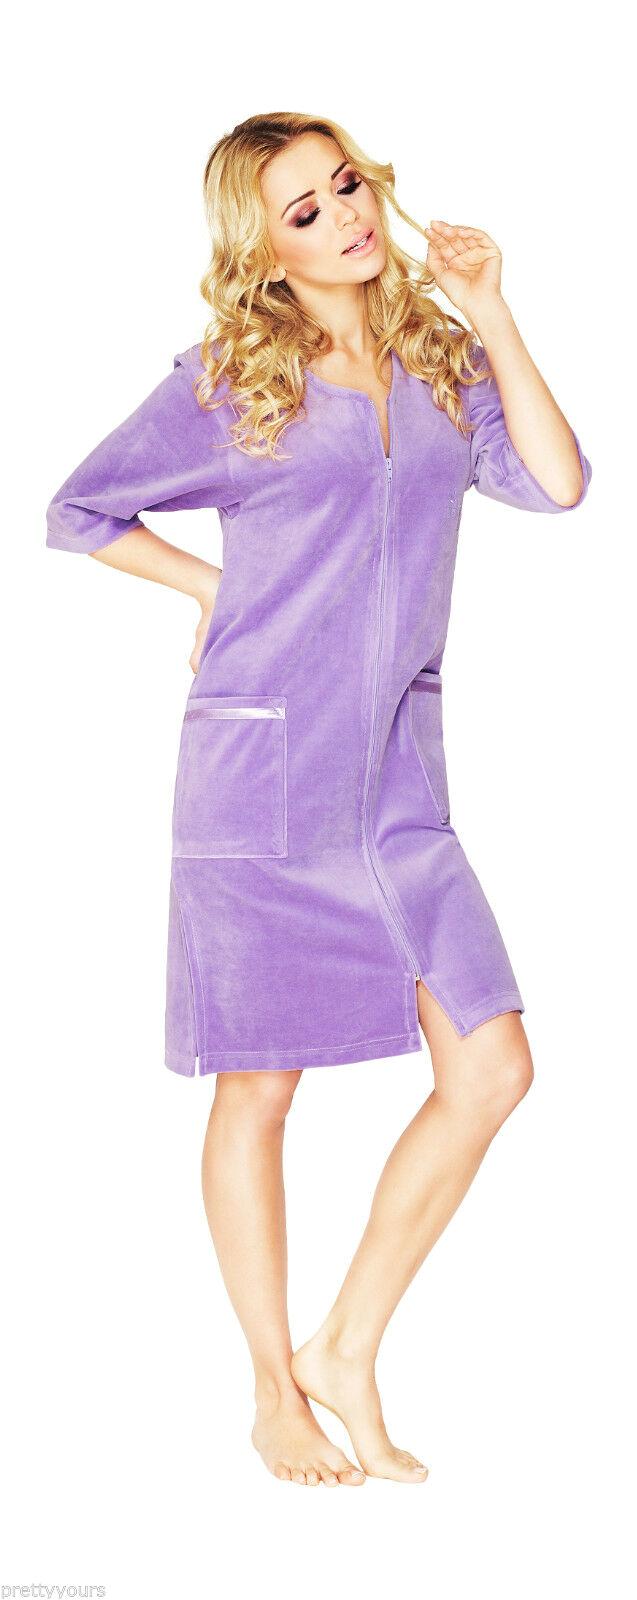 Women's Bathrobes Terry Cloth Women S Cotton Bath Robe Housecoat Dressing Gown Dress